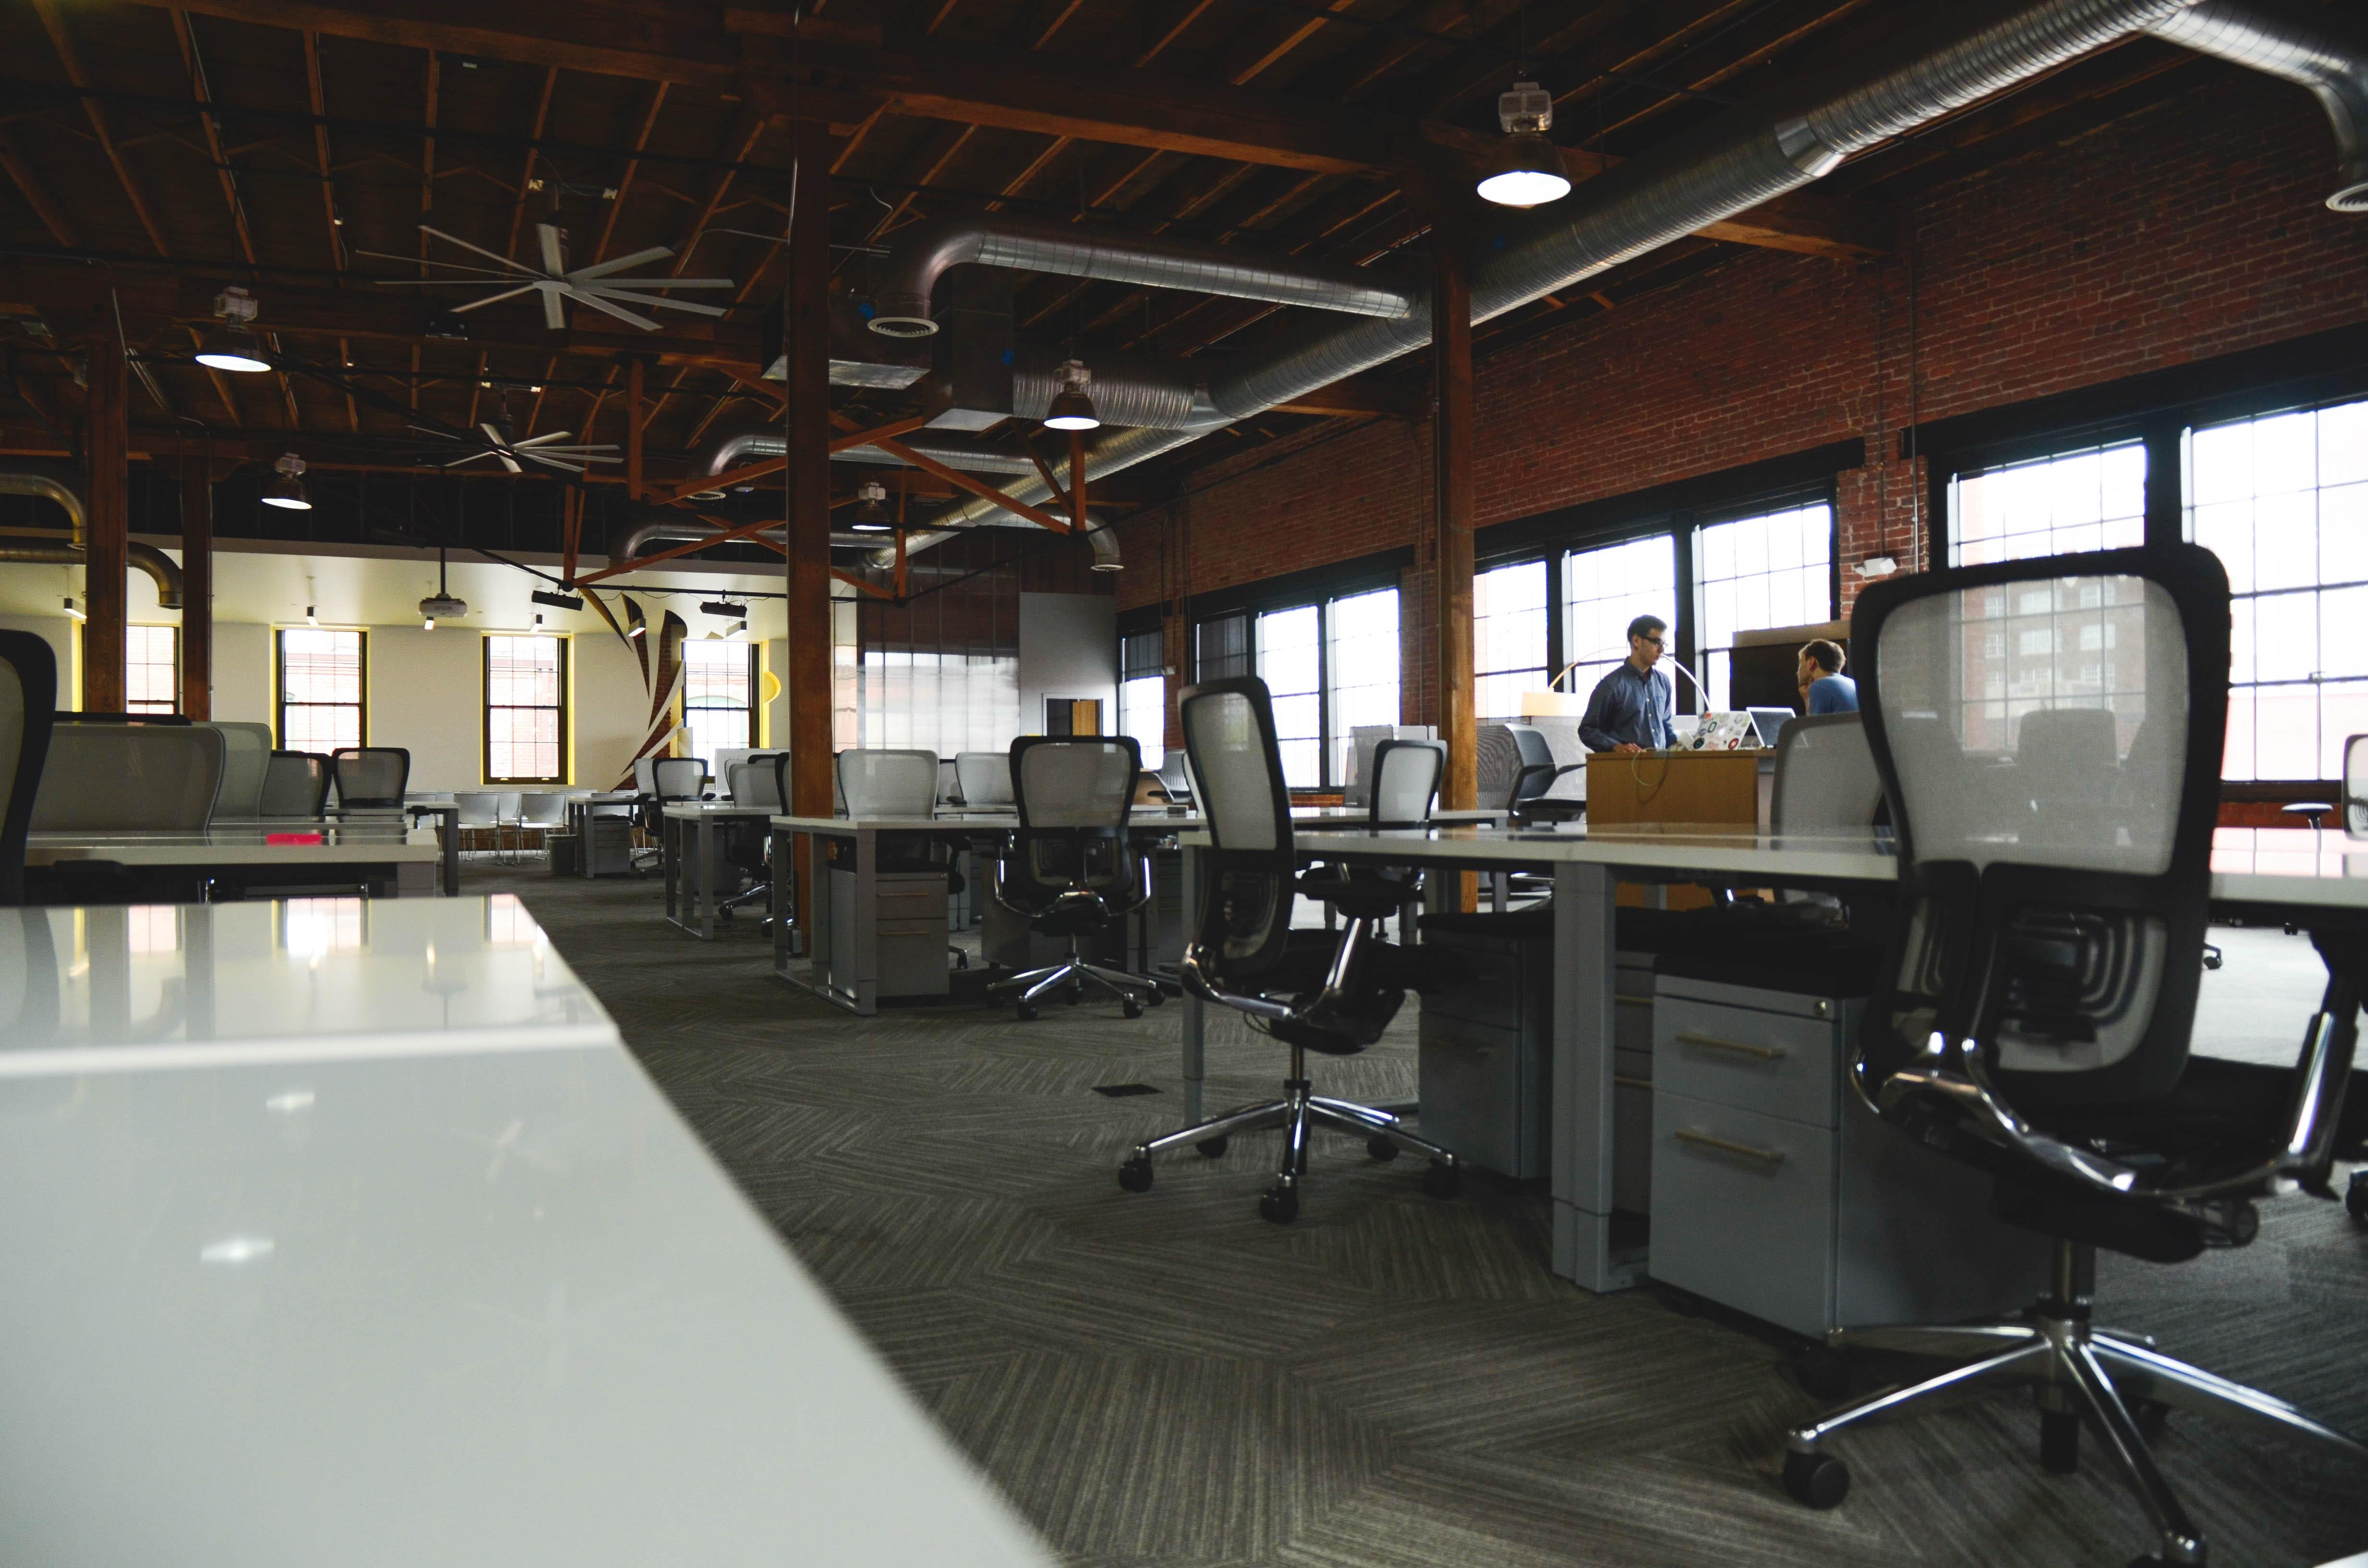 Free images building office furniture room work for Interior design startup